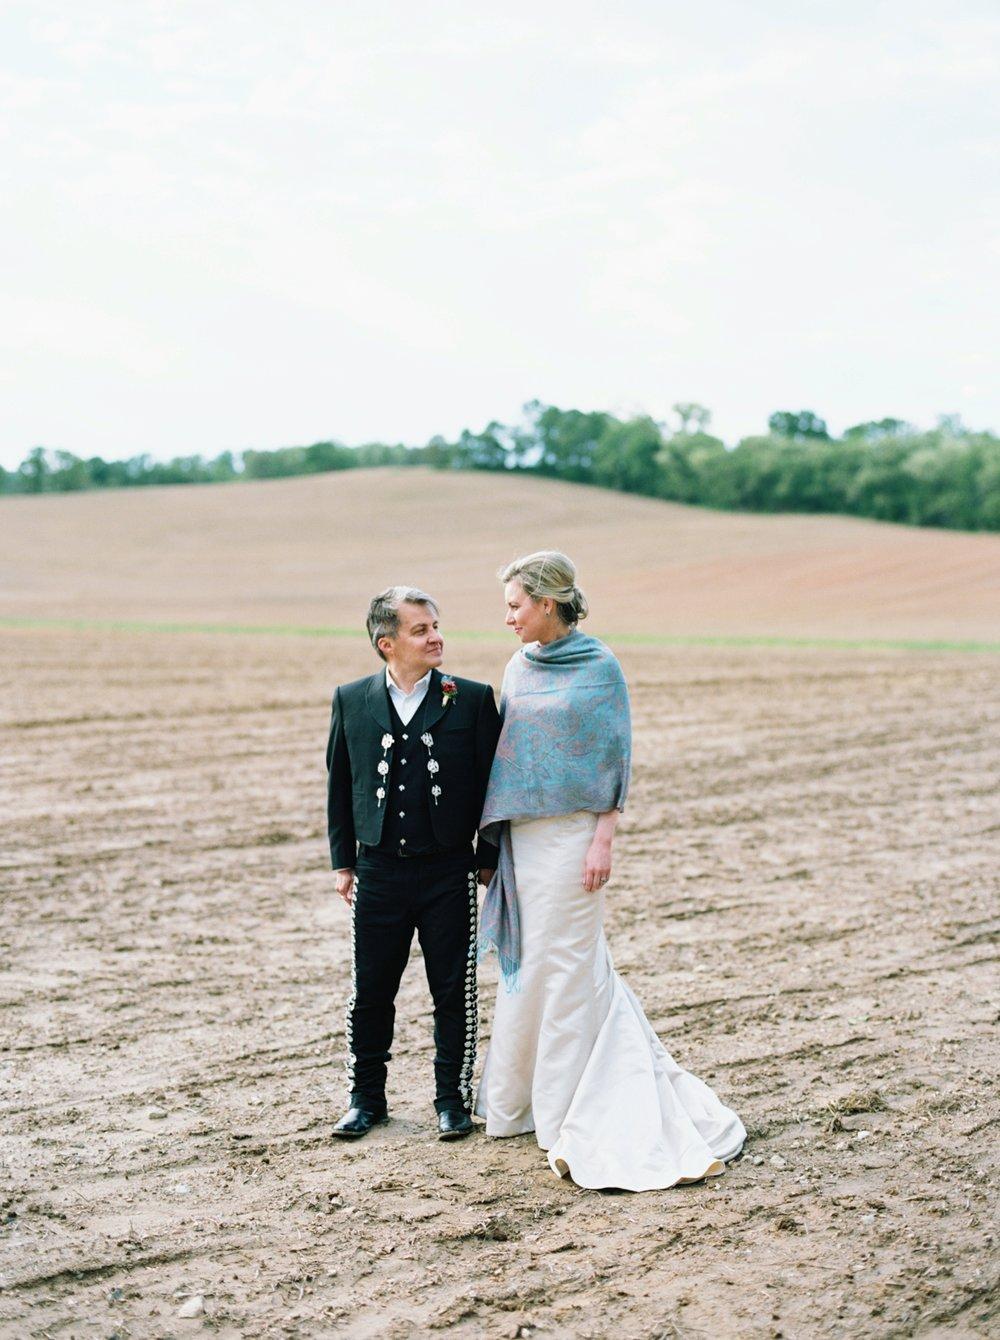 season magnolia manor wedding elisa ignacio czar goss photo 37.jpg